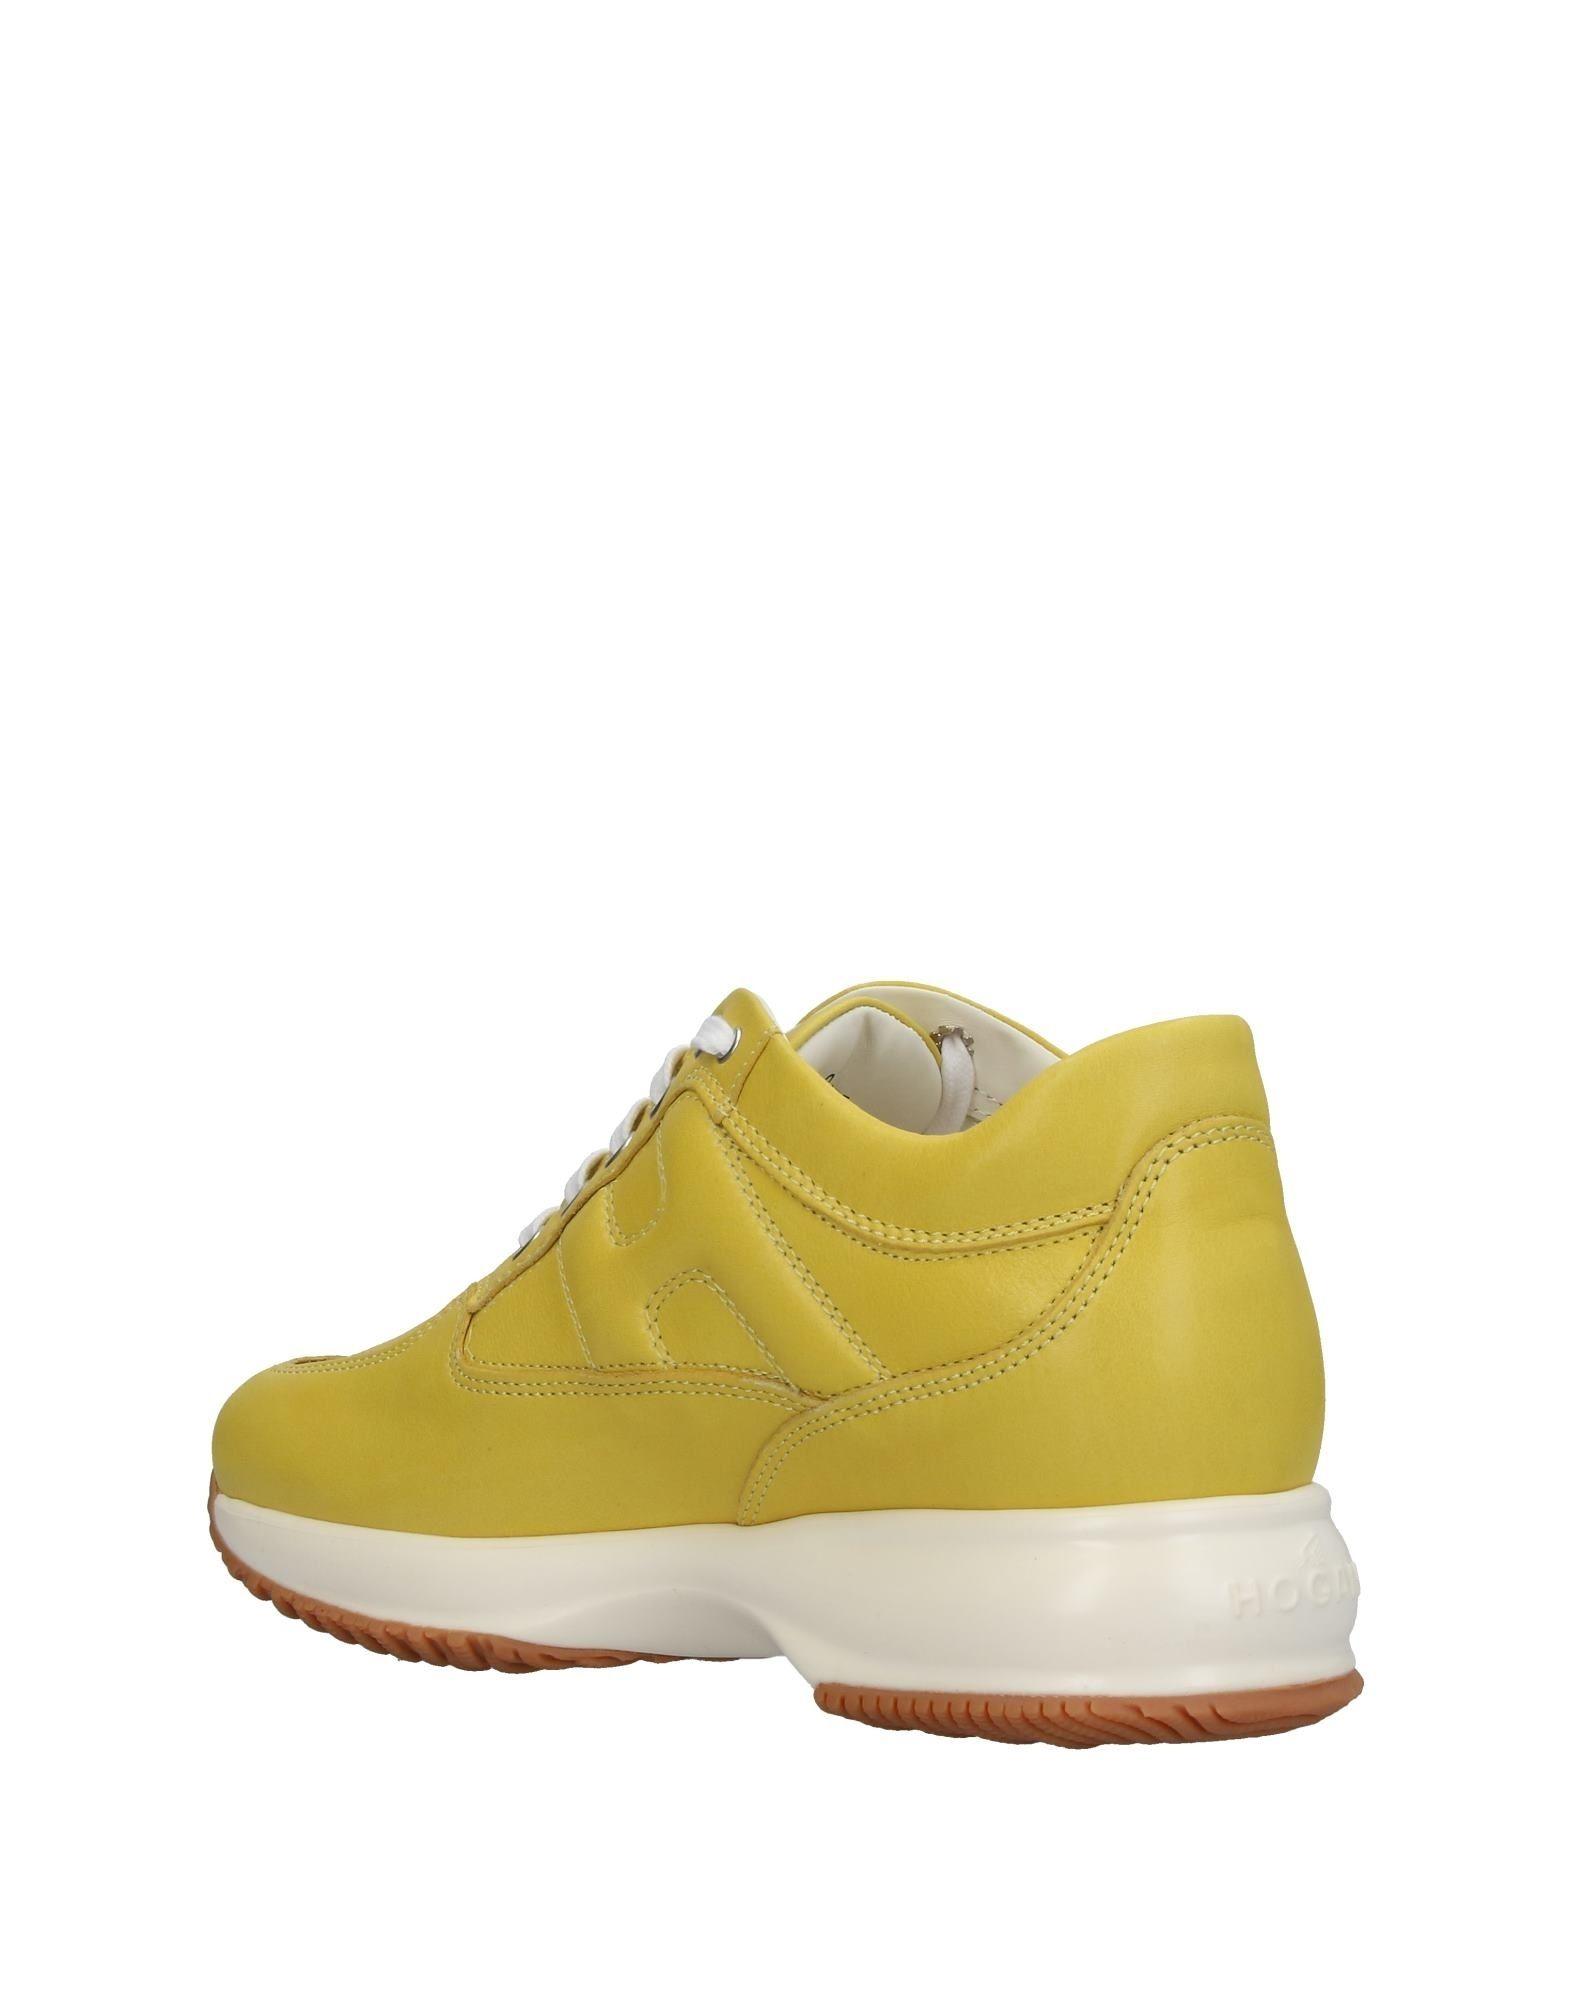 Hogan Sneakers Damen  11412758AGGut aussehende strapazierfähige Schuhe